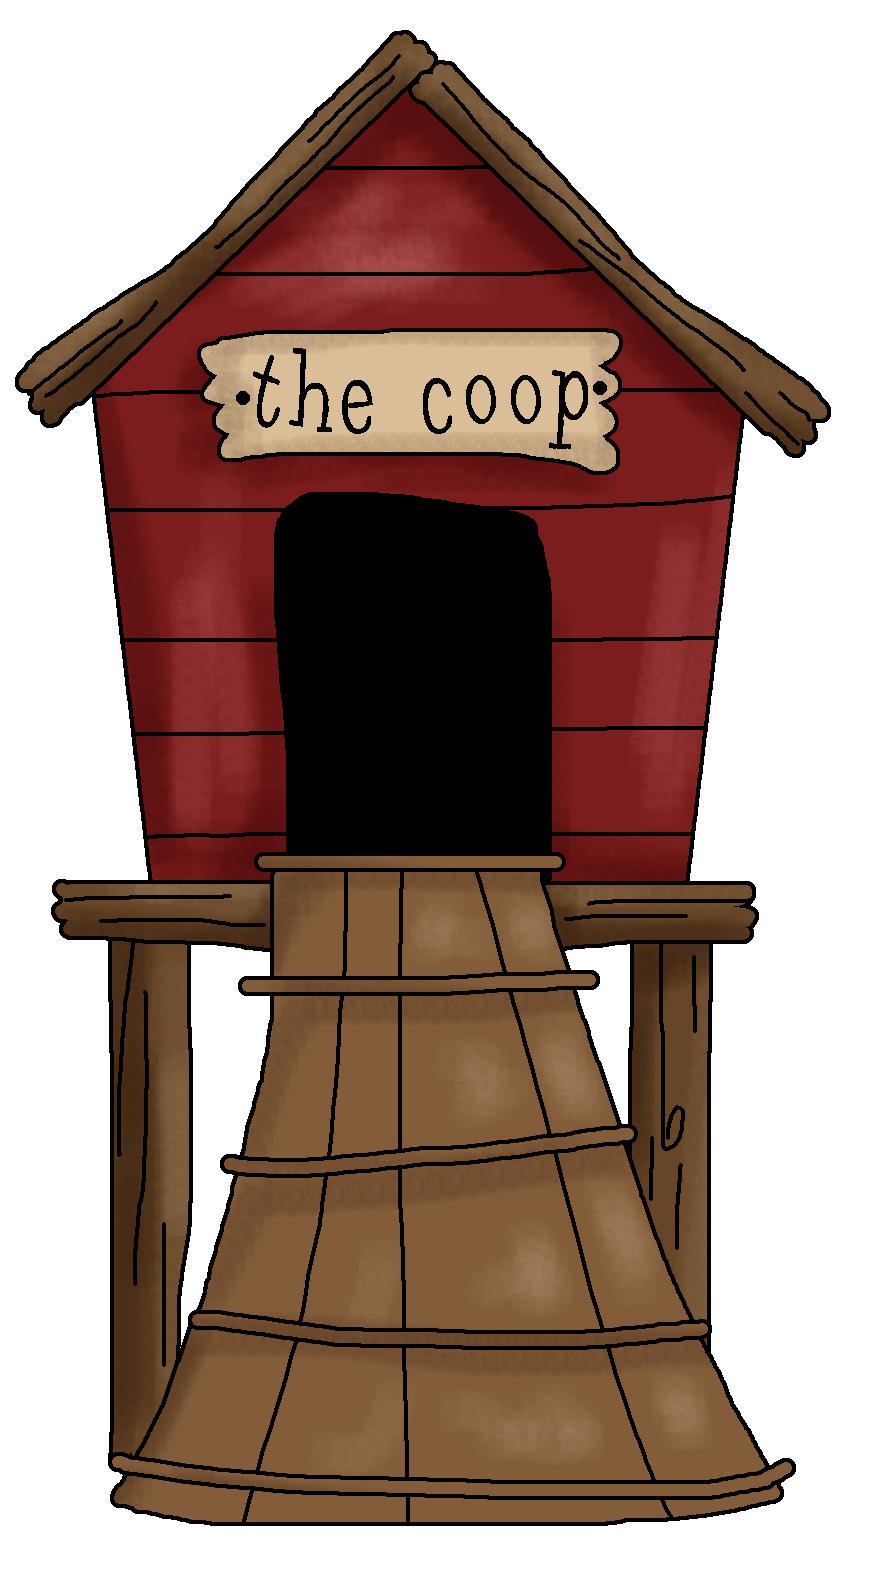 In Hen House Clipart Hen .-In Hen House Clipart Hen .-18